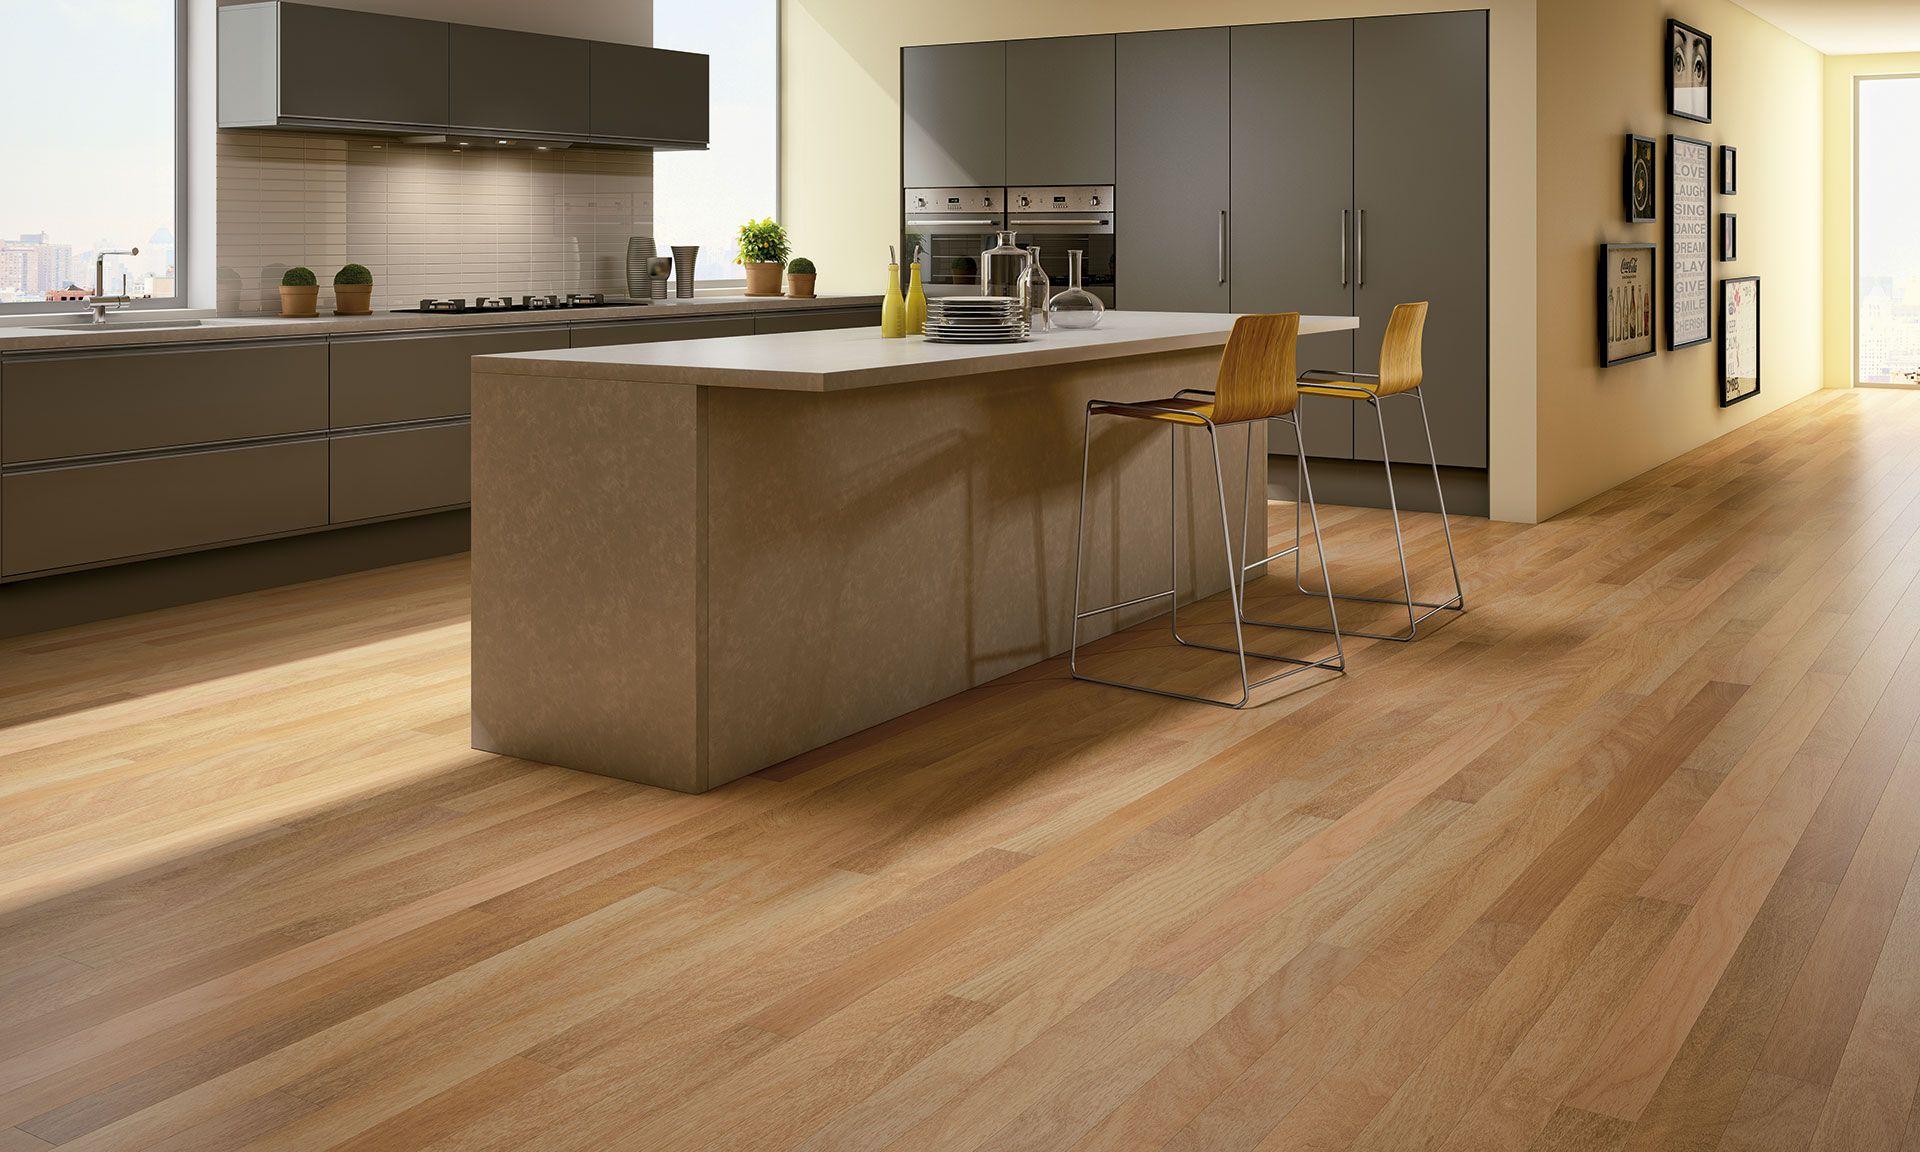 Pin On Triangulo Exotic Engineered Hardwood Flooring Nj New Jersey New York City